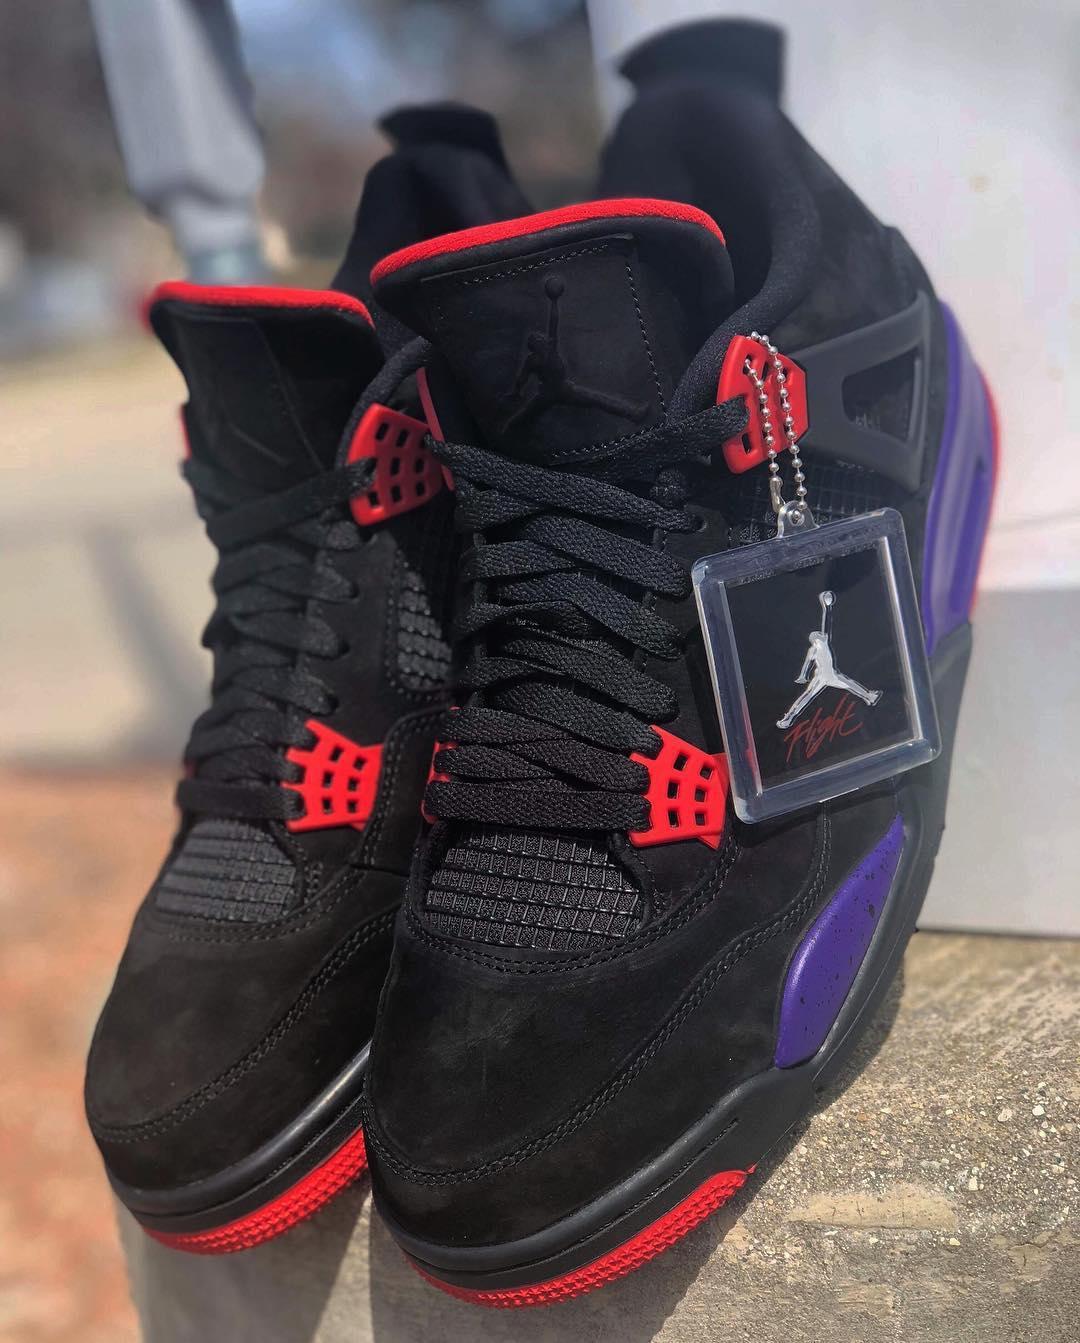 Air Jordan 4 NRG 'Black/University Red/Court Purple' AQ3816-056 (Pair)